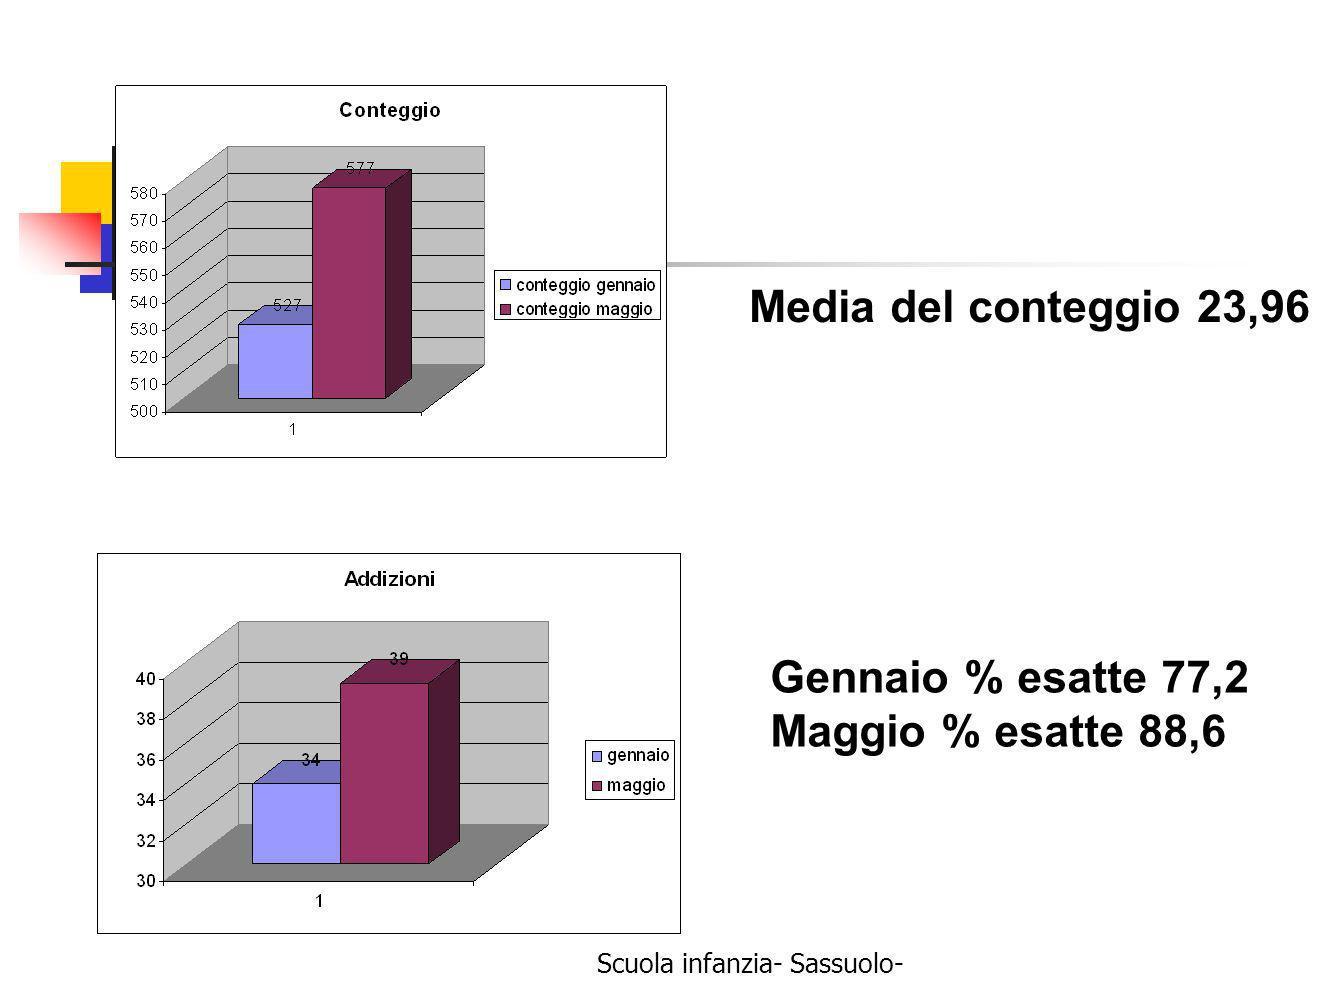 Media del conteggio 23,96 Gennaio % esatte 77,2 Maggio % esatte 88,6